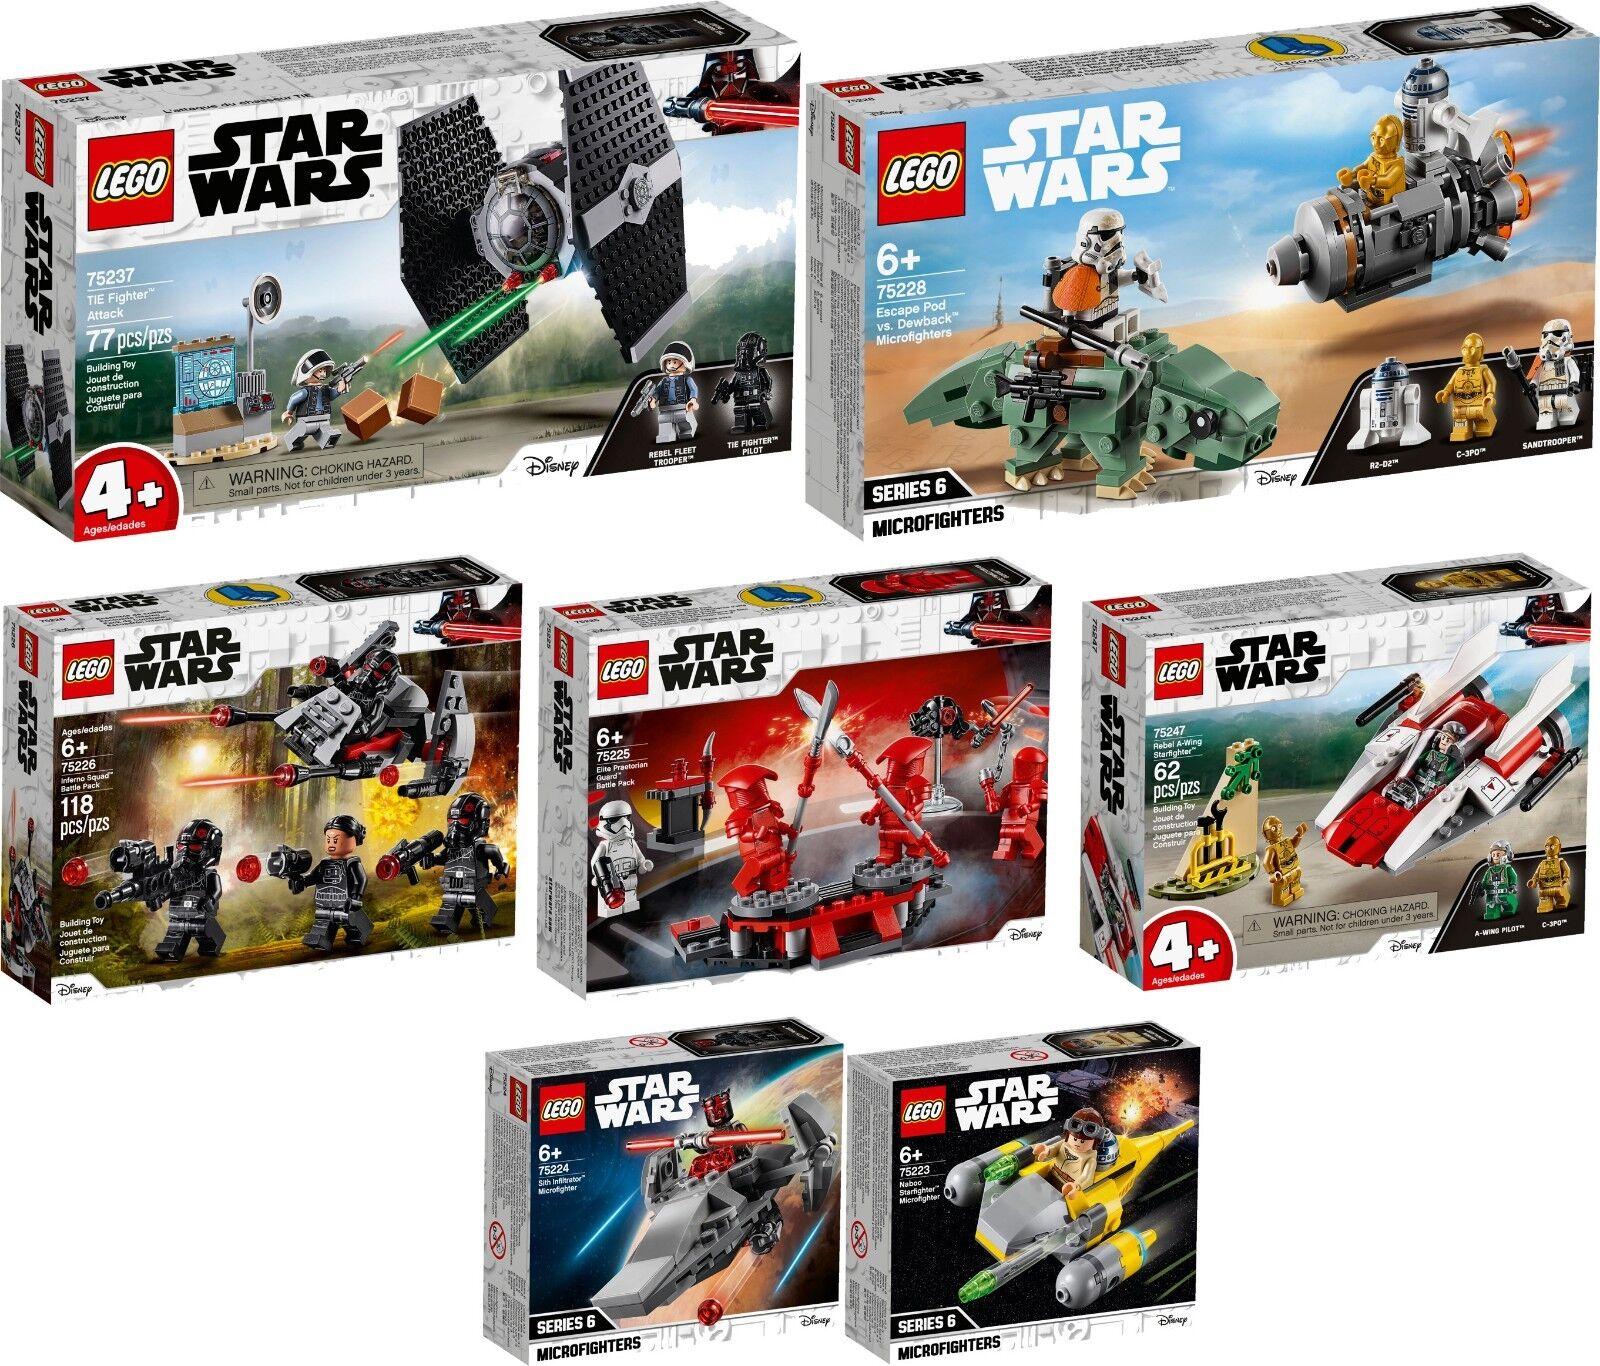 LEGO STAR WARS 75237 75228 75226 75225 75224 75223 75247 N1/19 VORVERKAUF